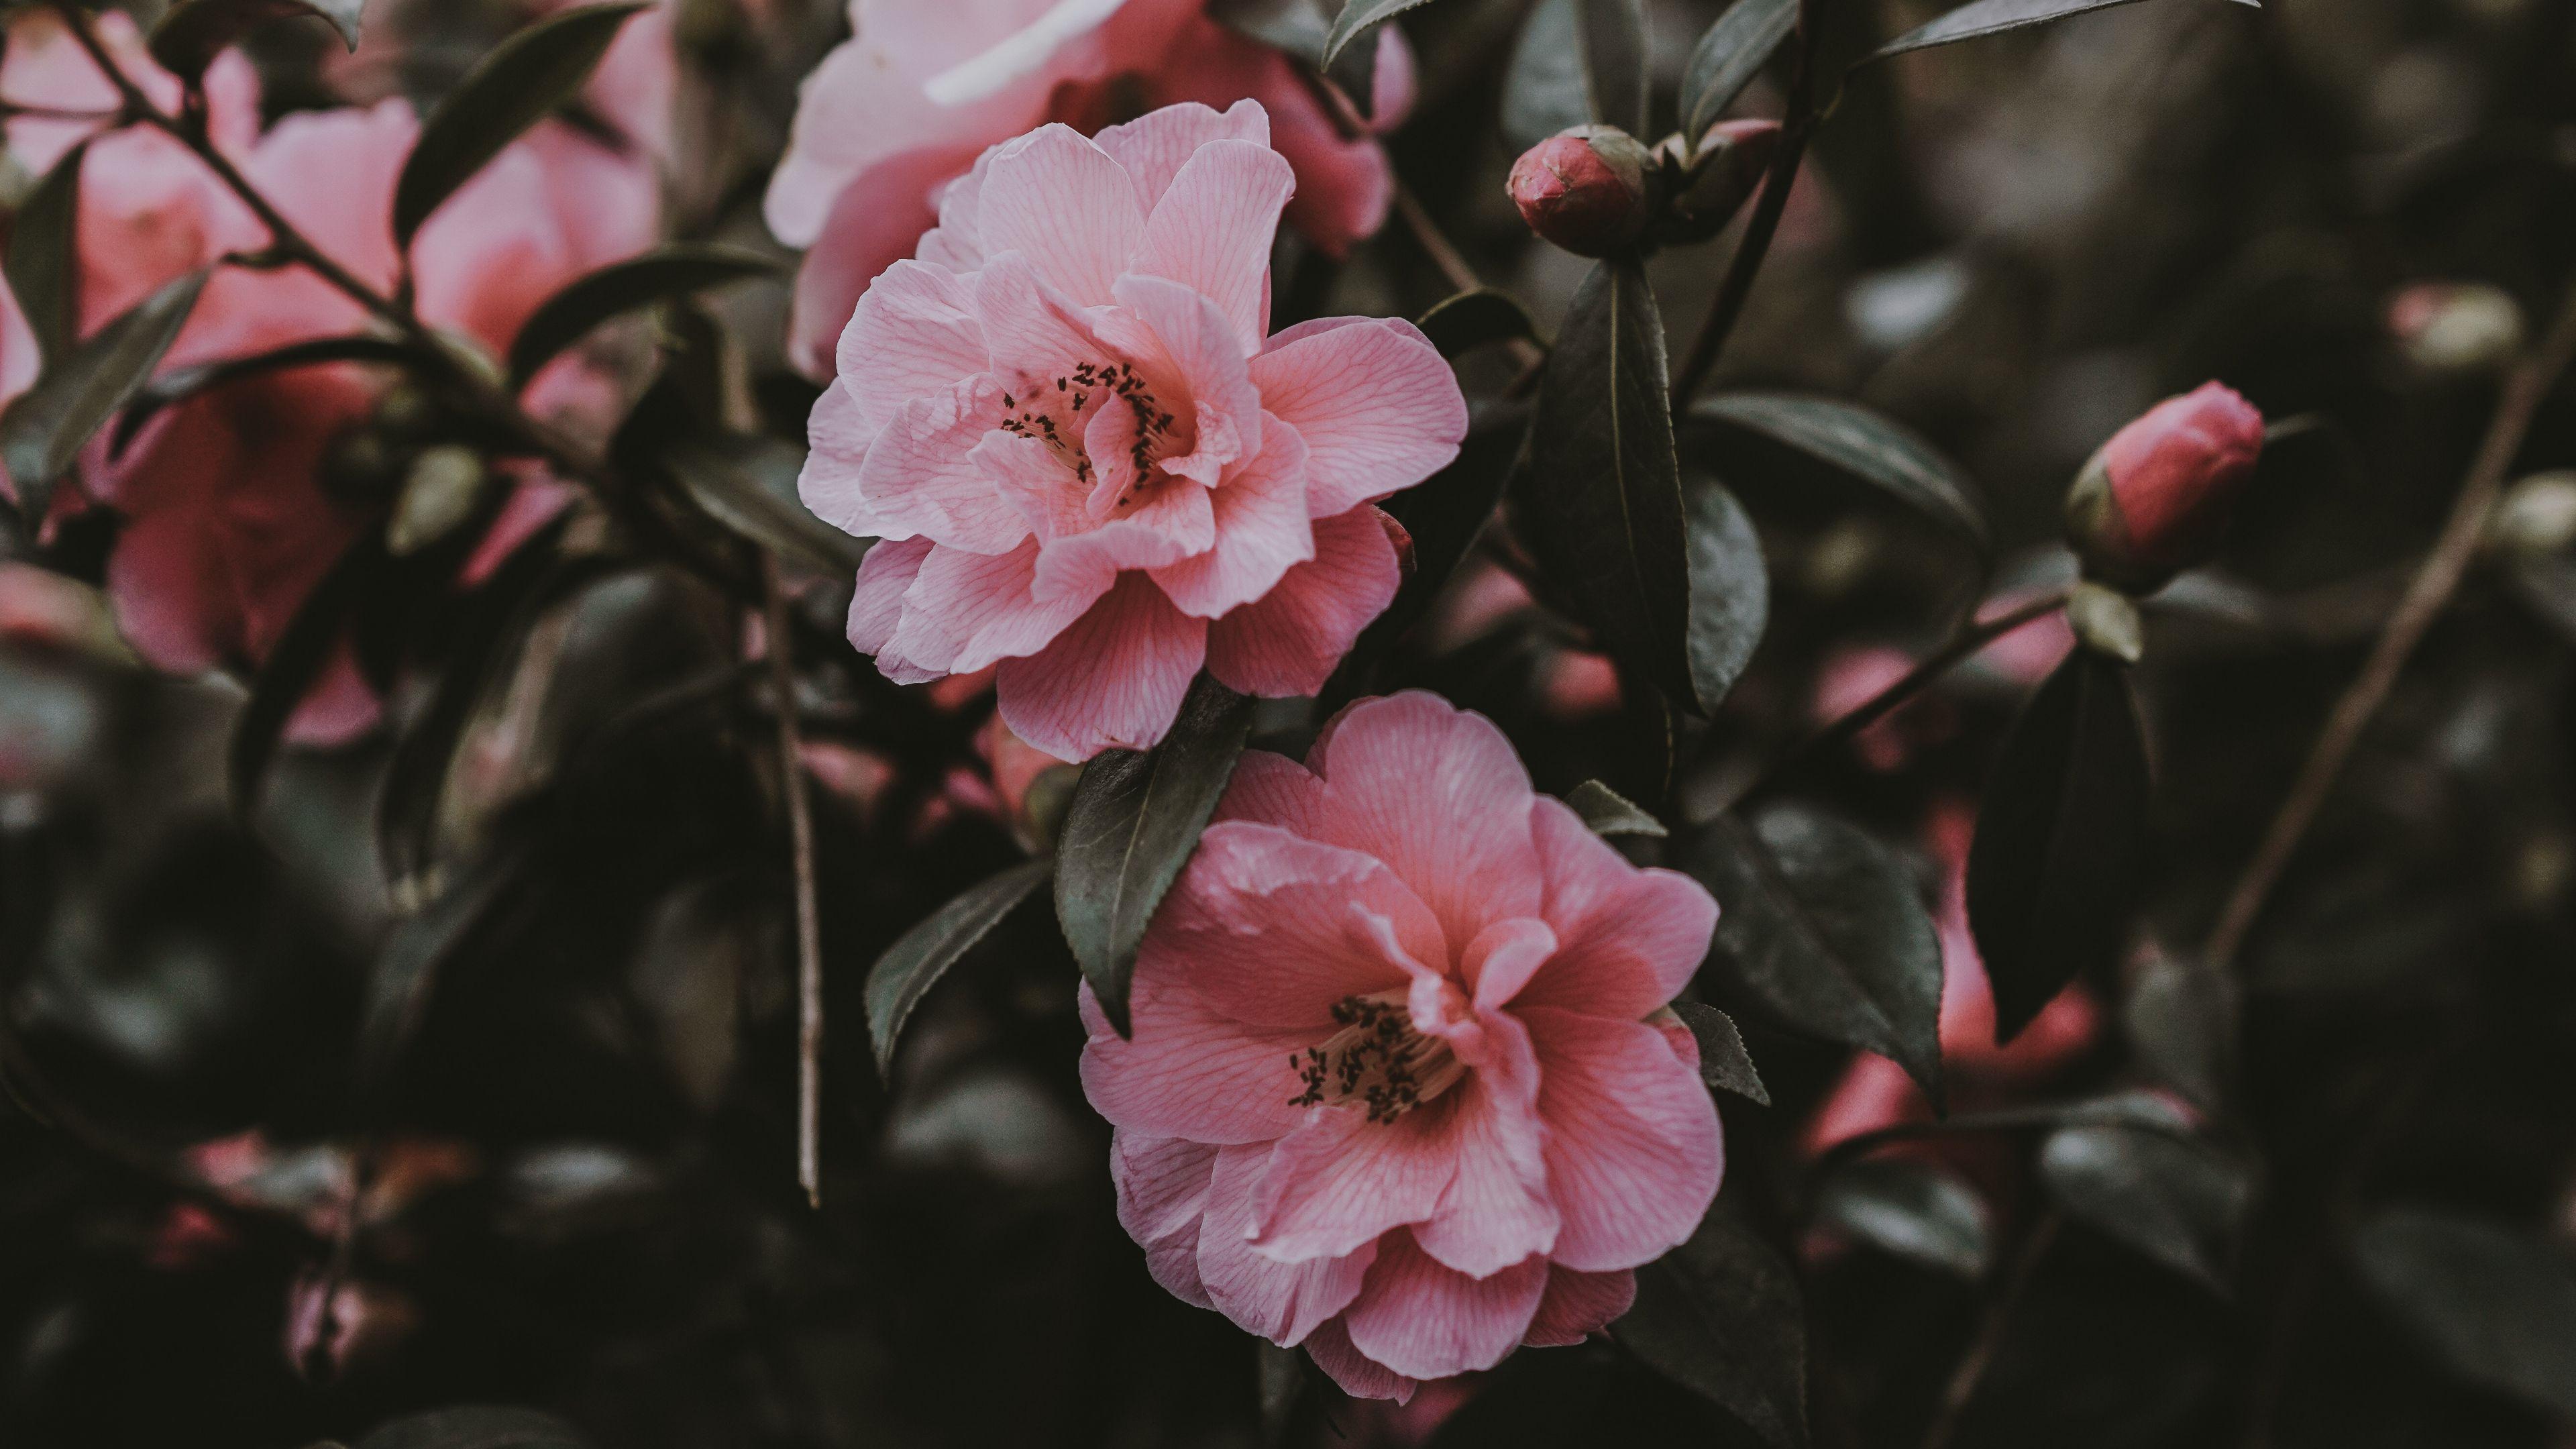 3840x2160 Wallpaper wild rose, bush, pink, flowers